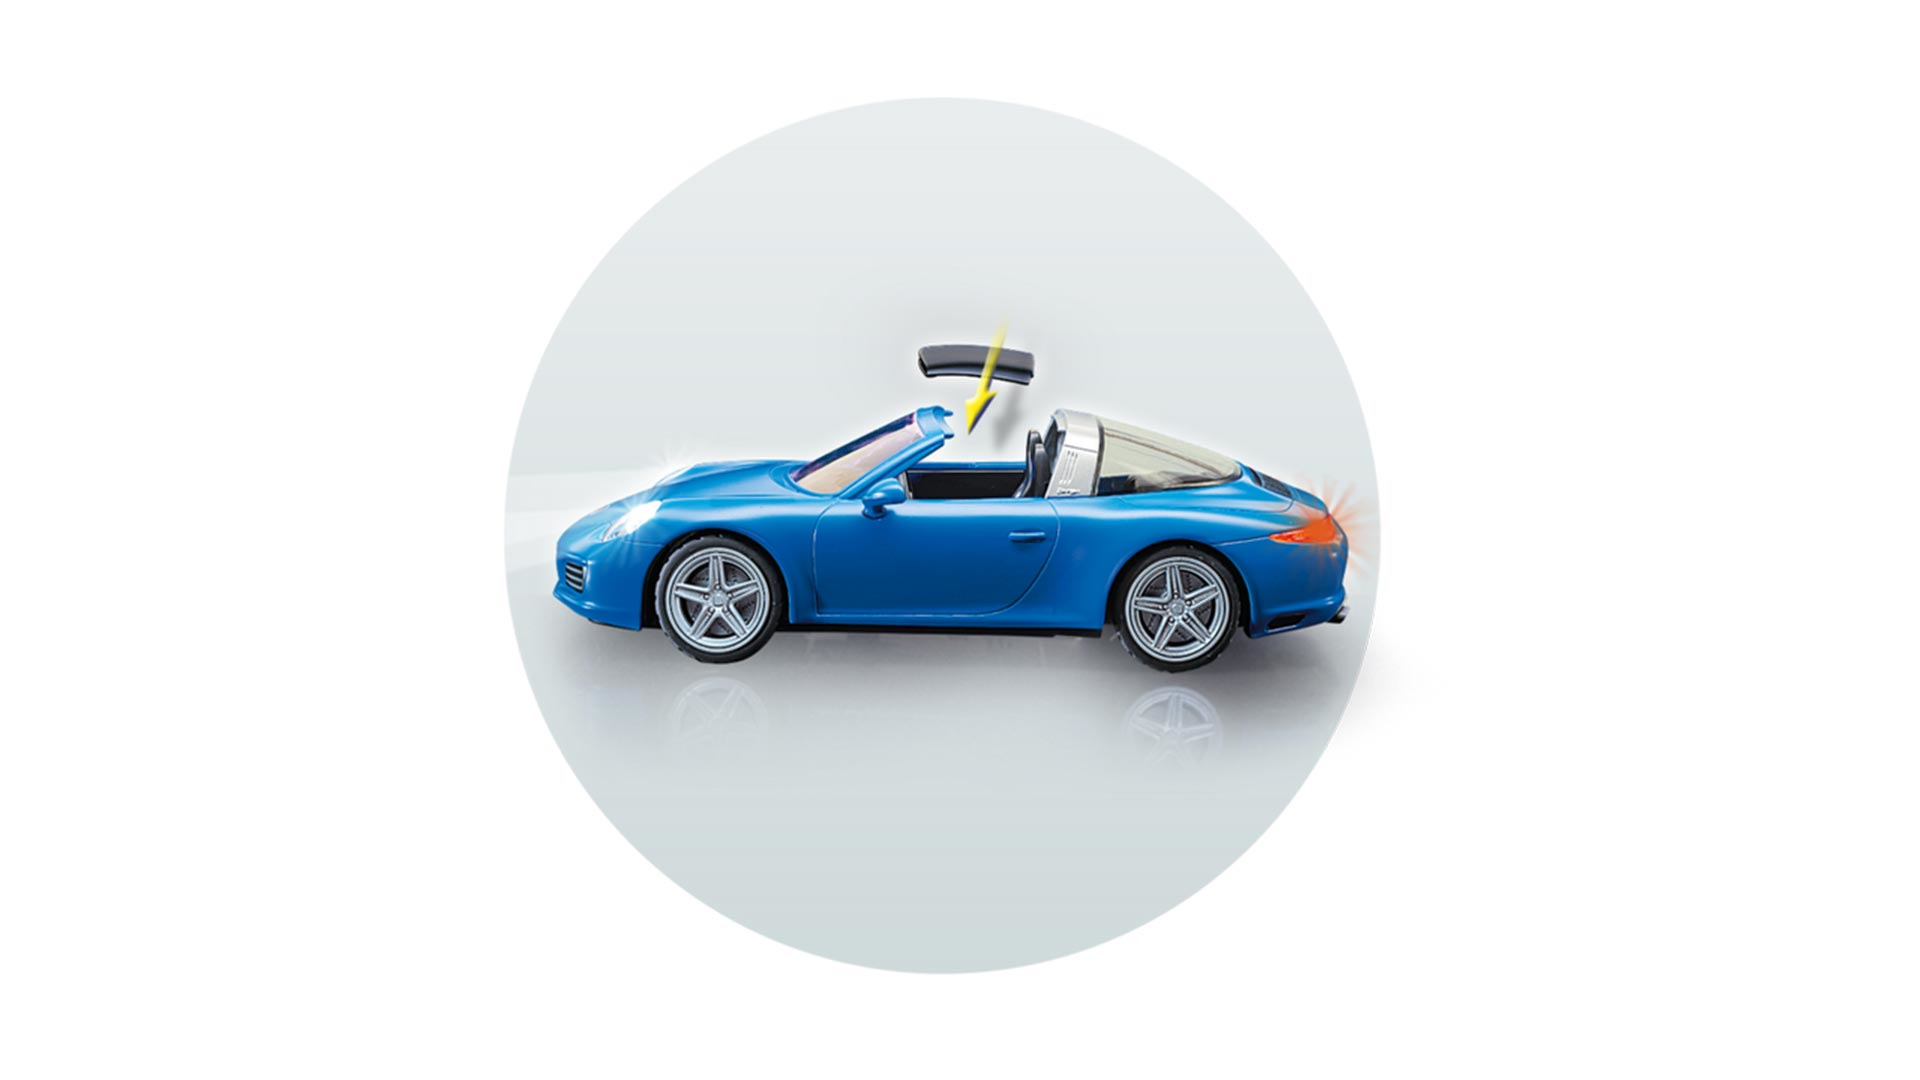 playmobil-porsche-911-targa-4s (4)